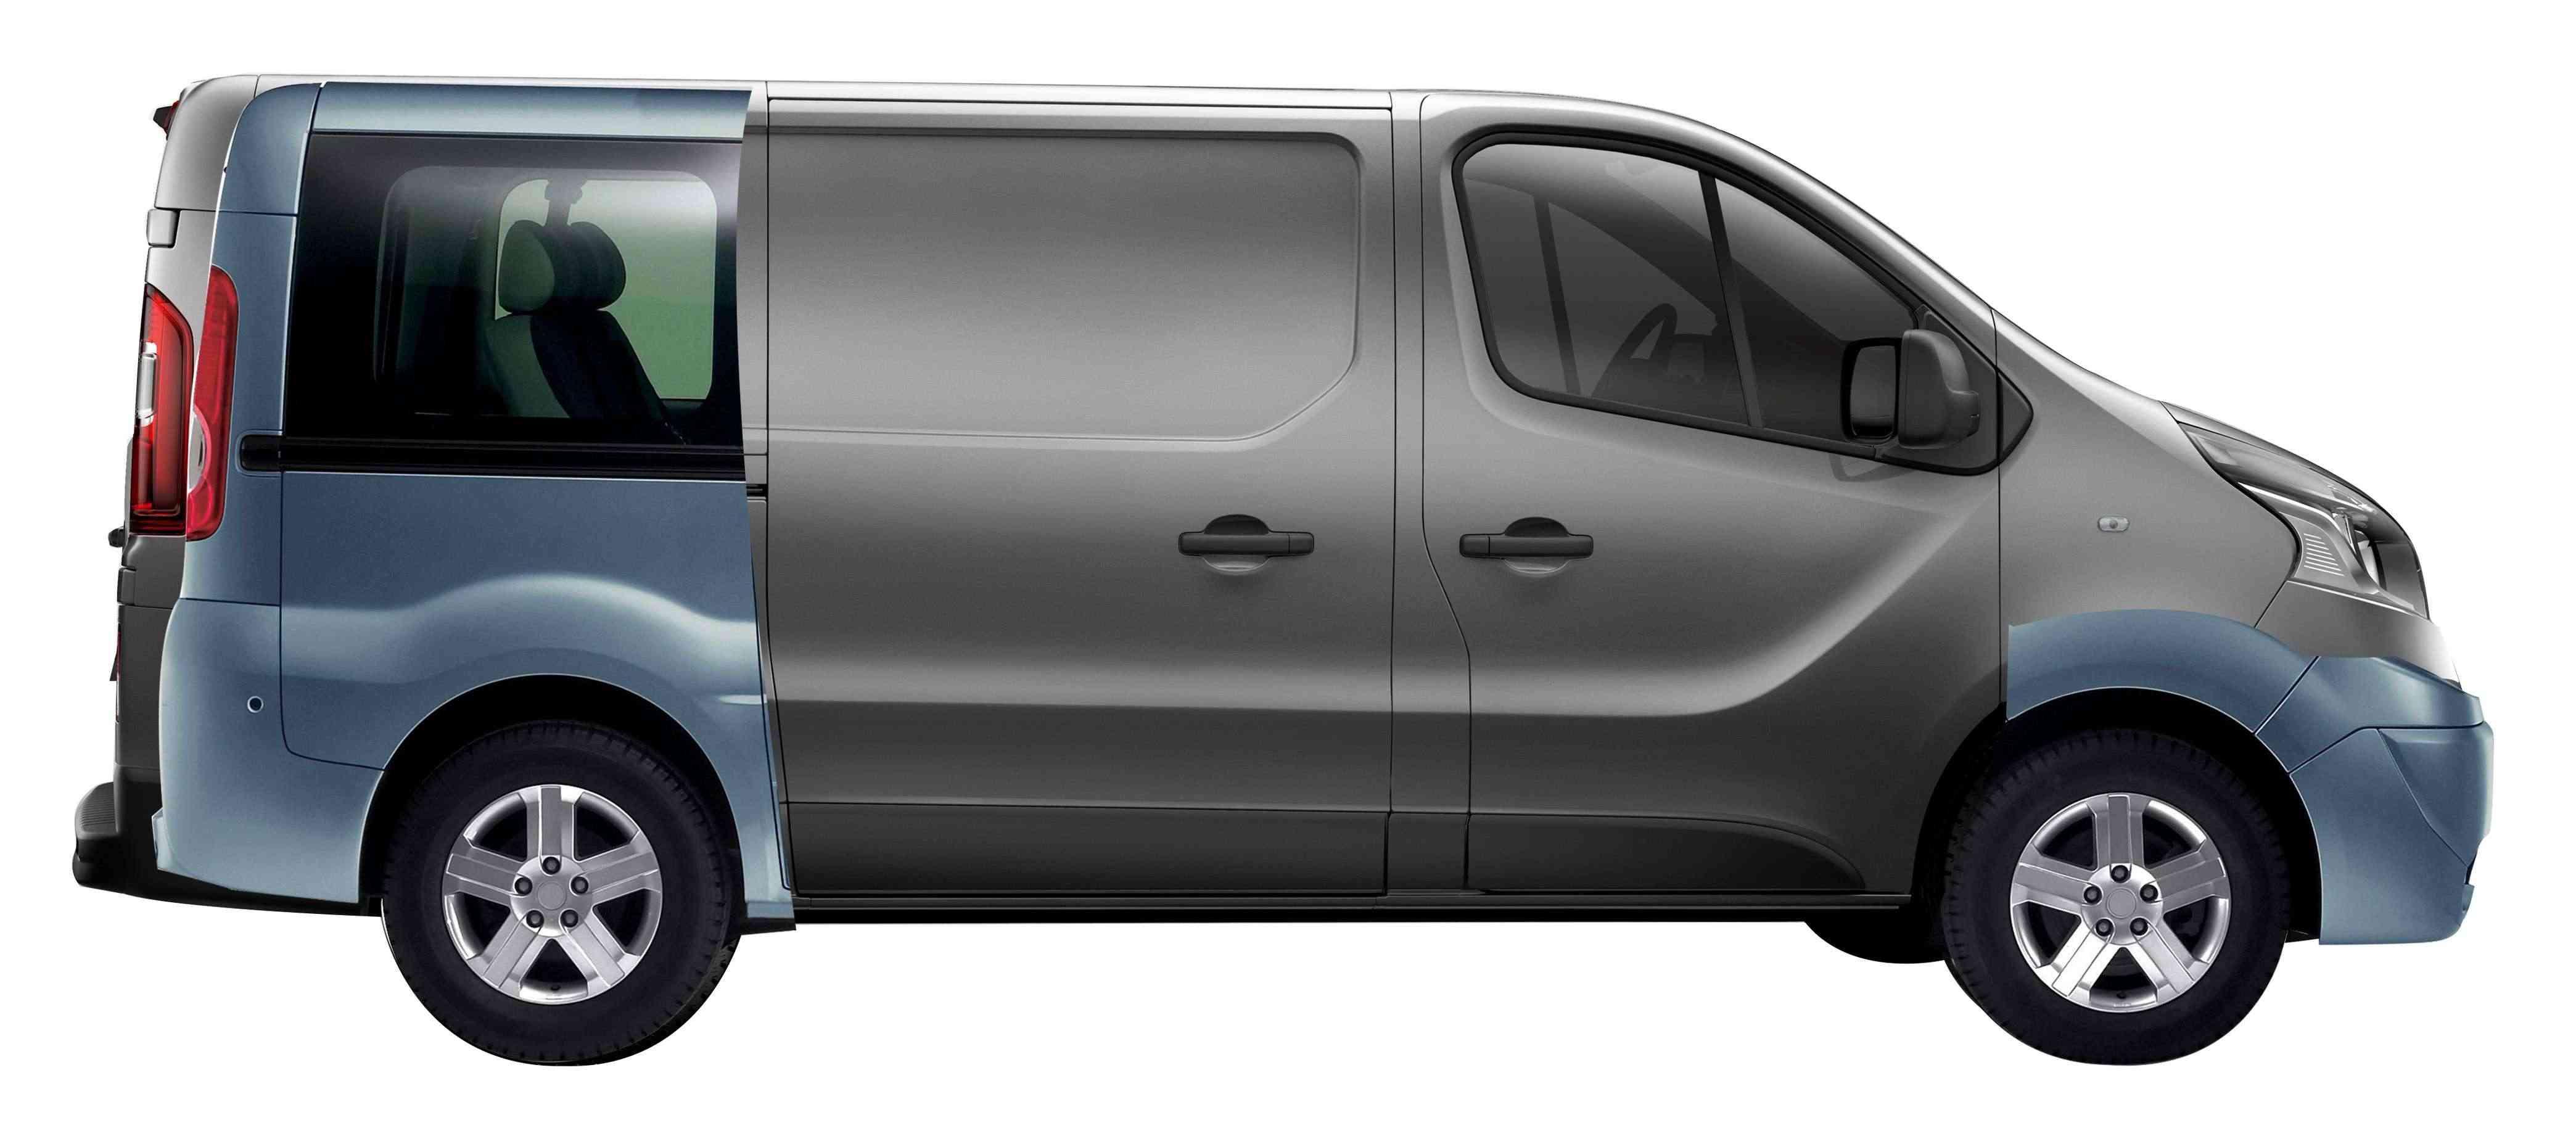 2014 [Renault/Opel/Fiat/Nissan] Trafic/Vivaro/Talento/NV300 - Page 6 Renaul14